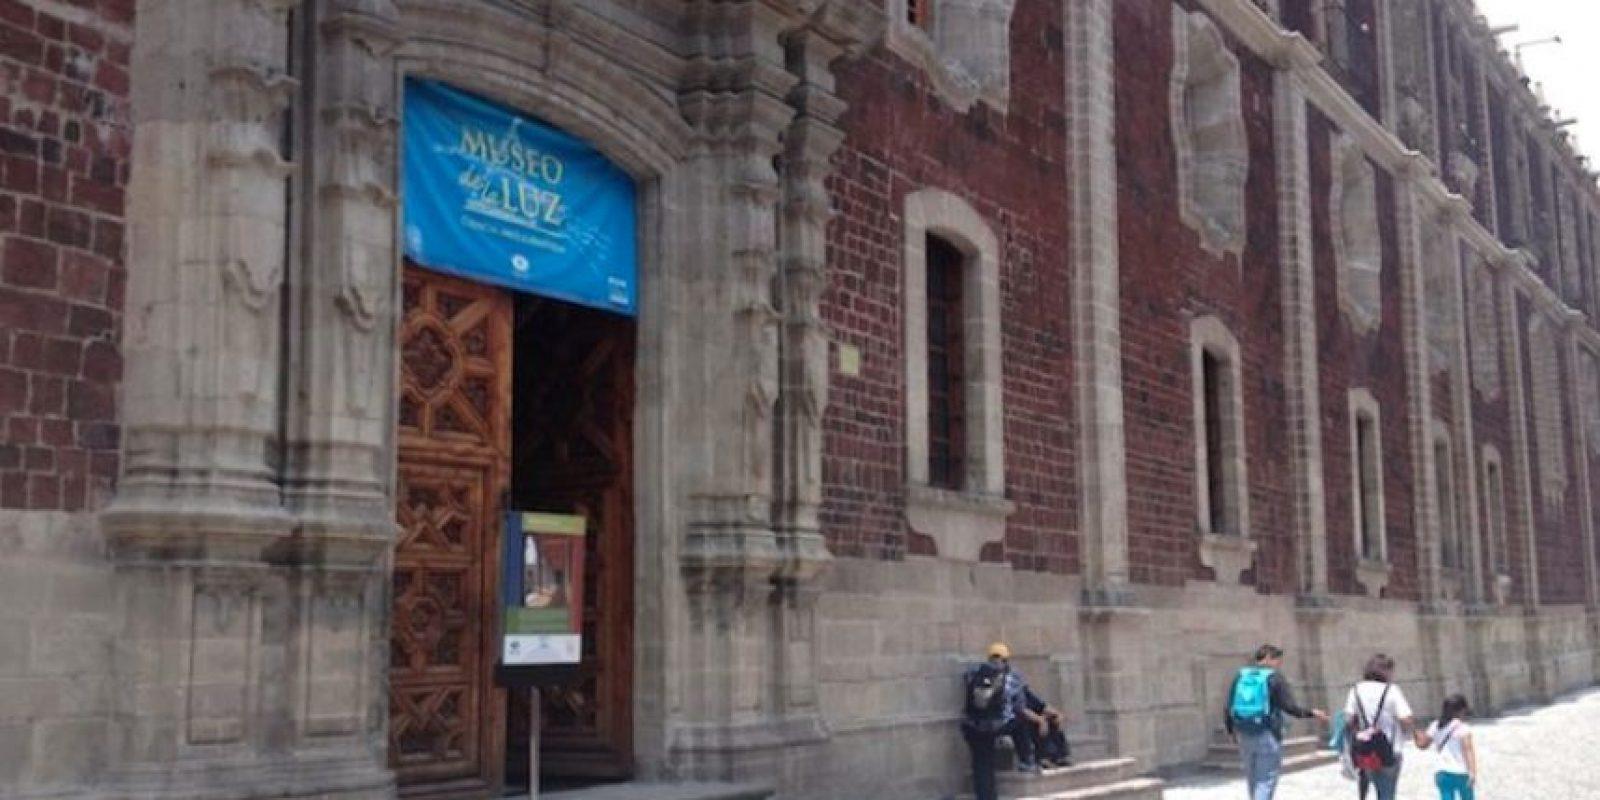 Mexicana se gana el aumento de sueldo mamando verga video completo en httpcutpaidcomuht9t - 4 3